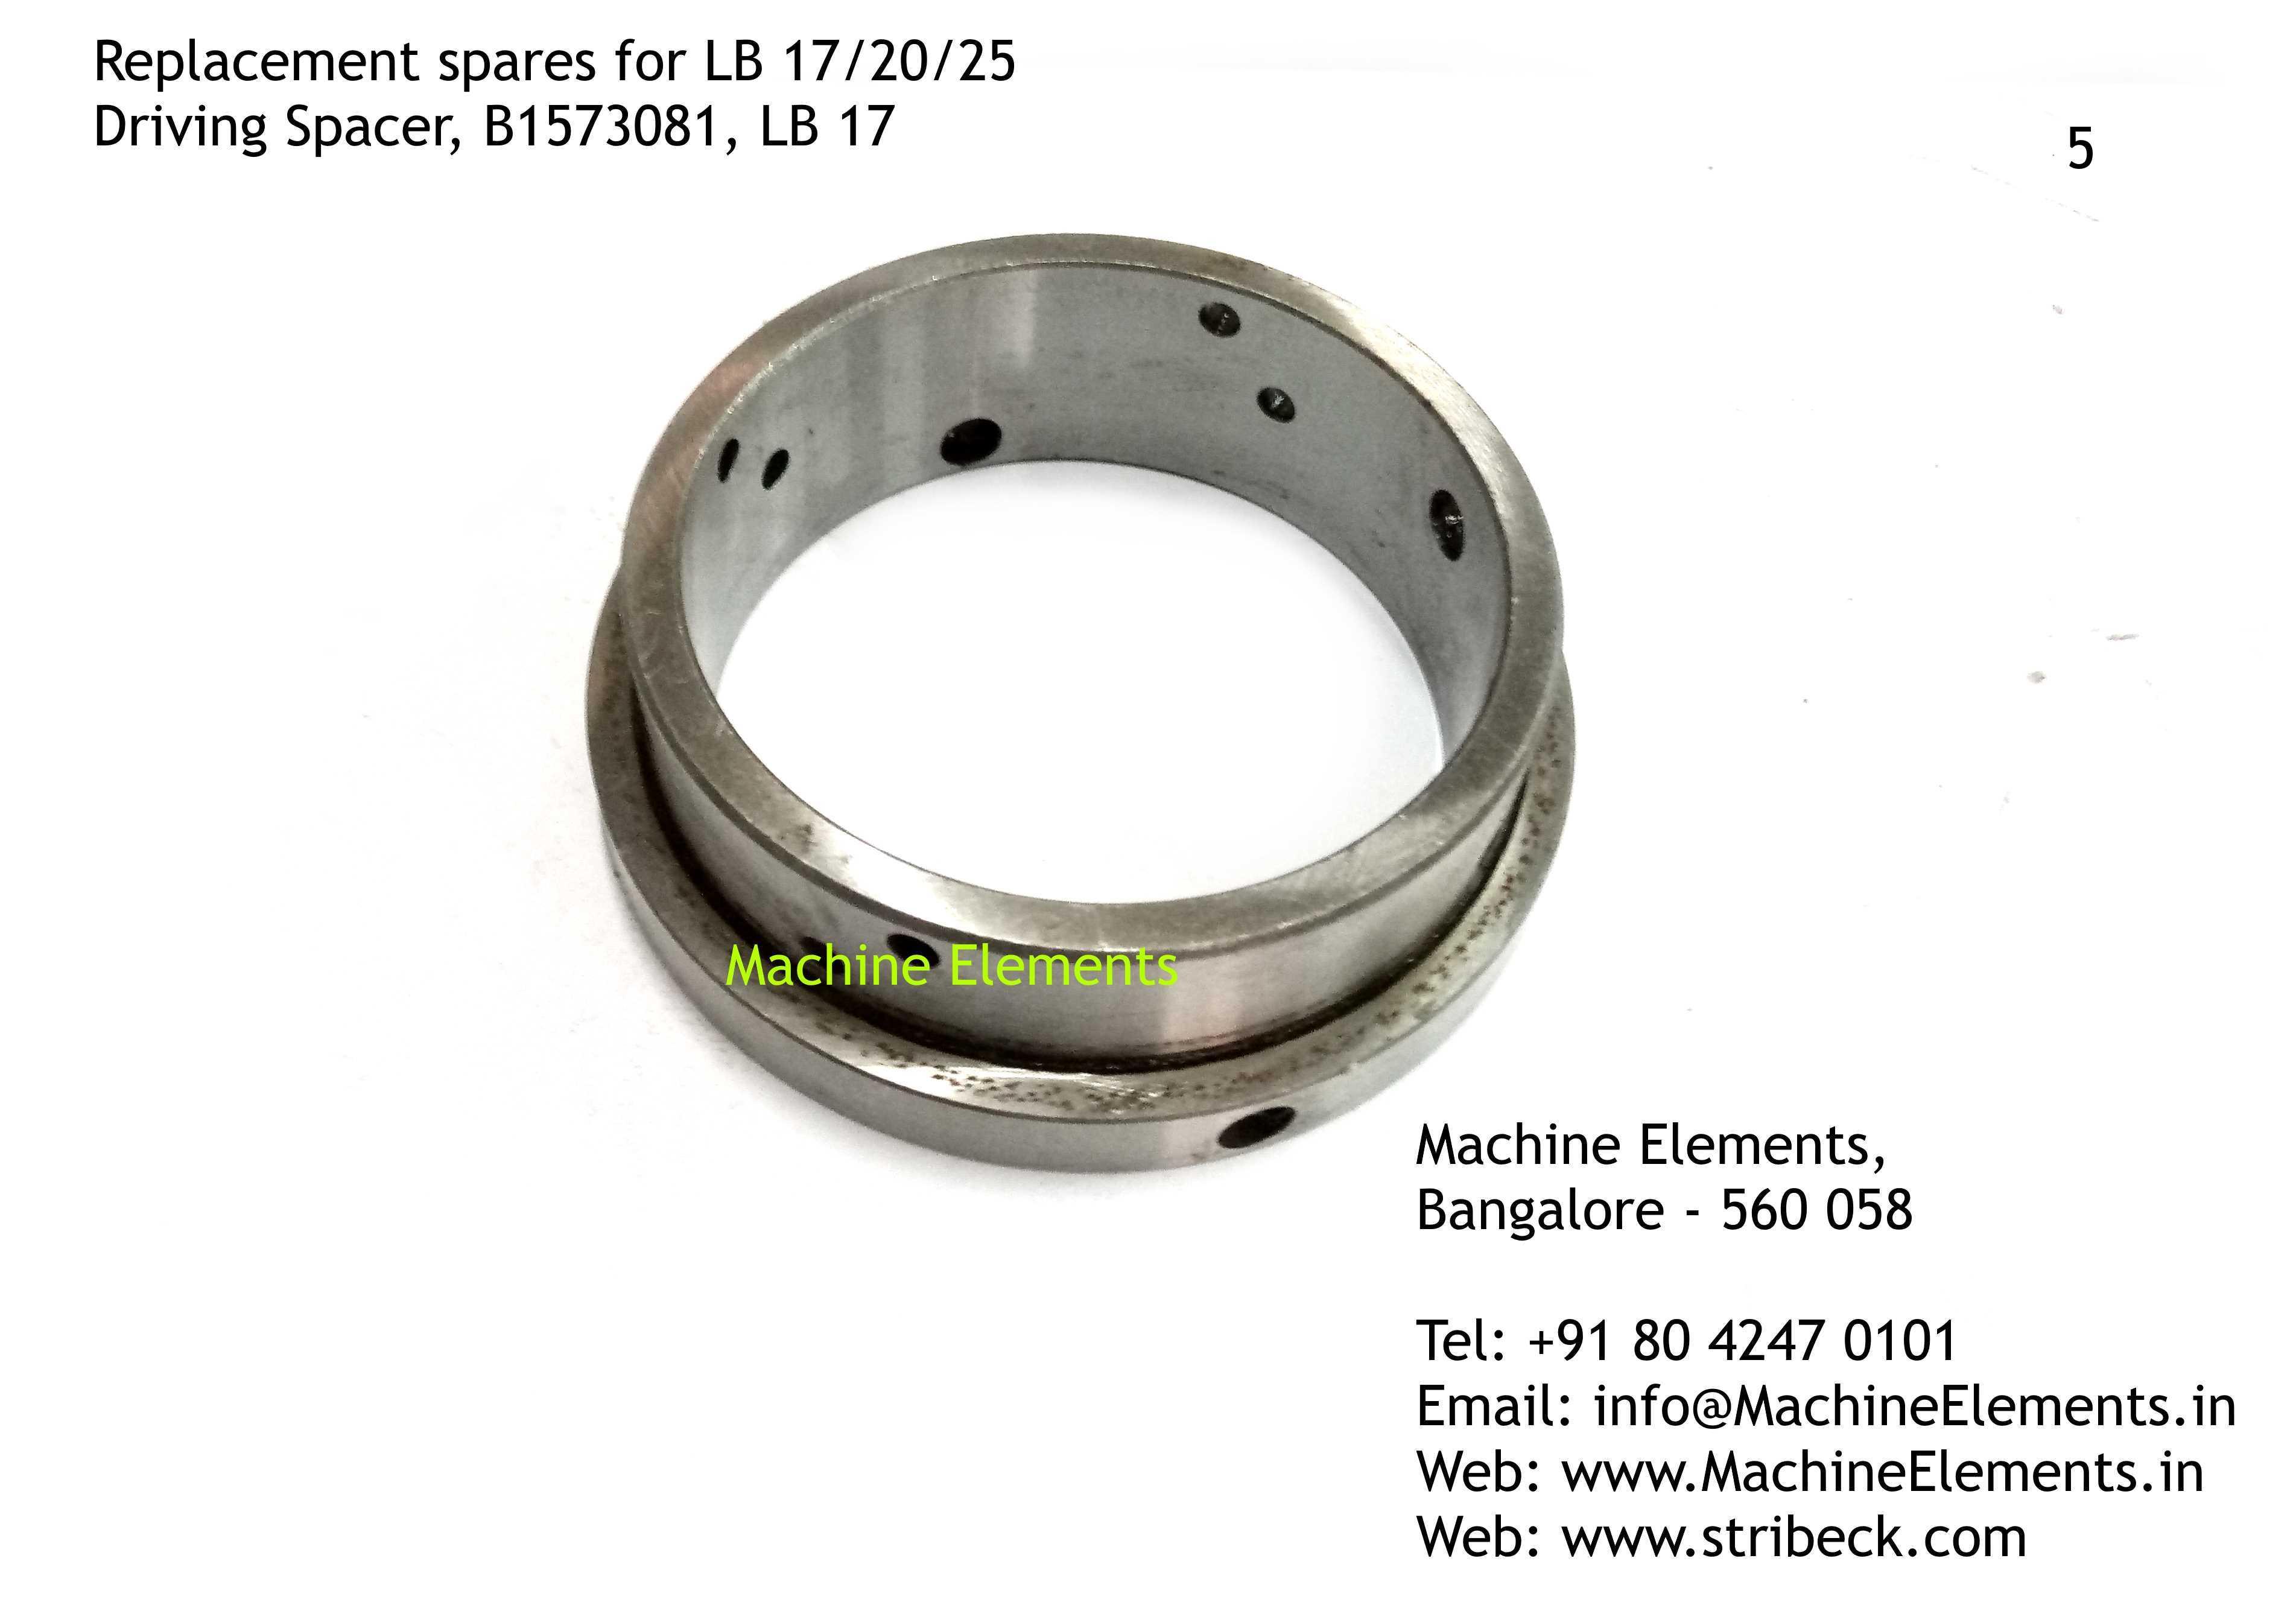 Driving Spacer, B1573081, LB 17